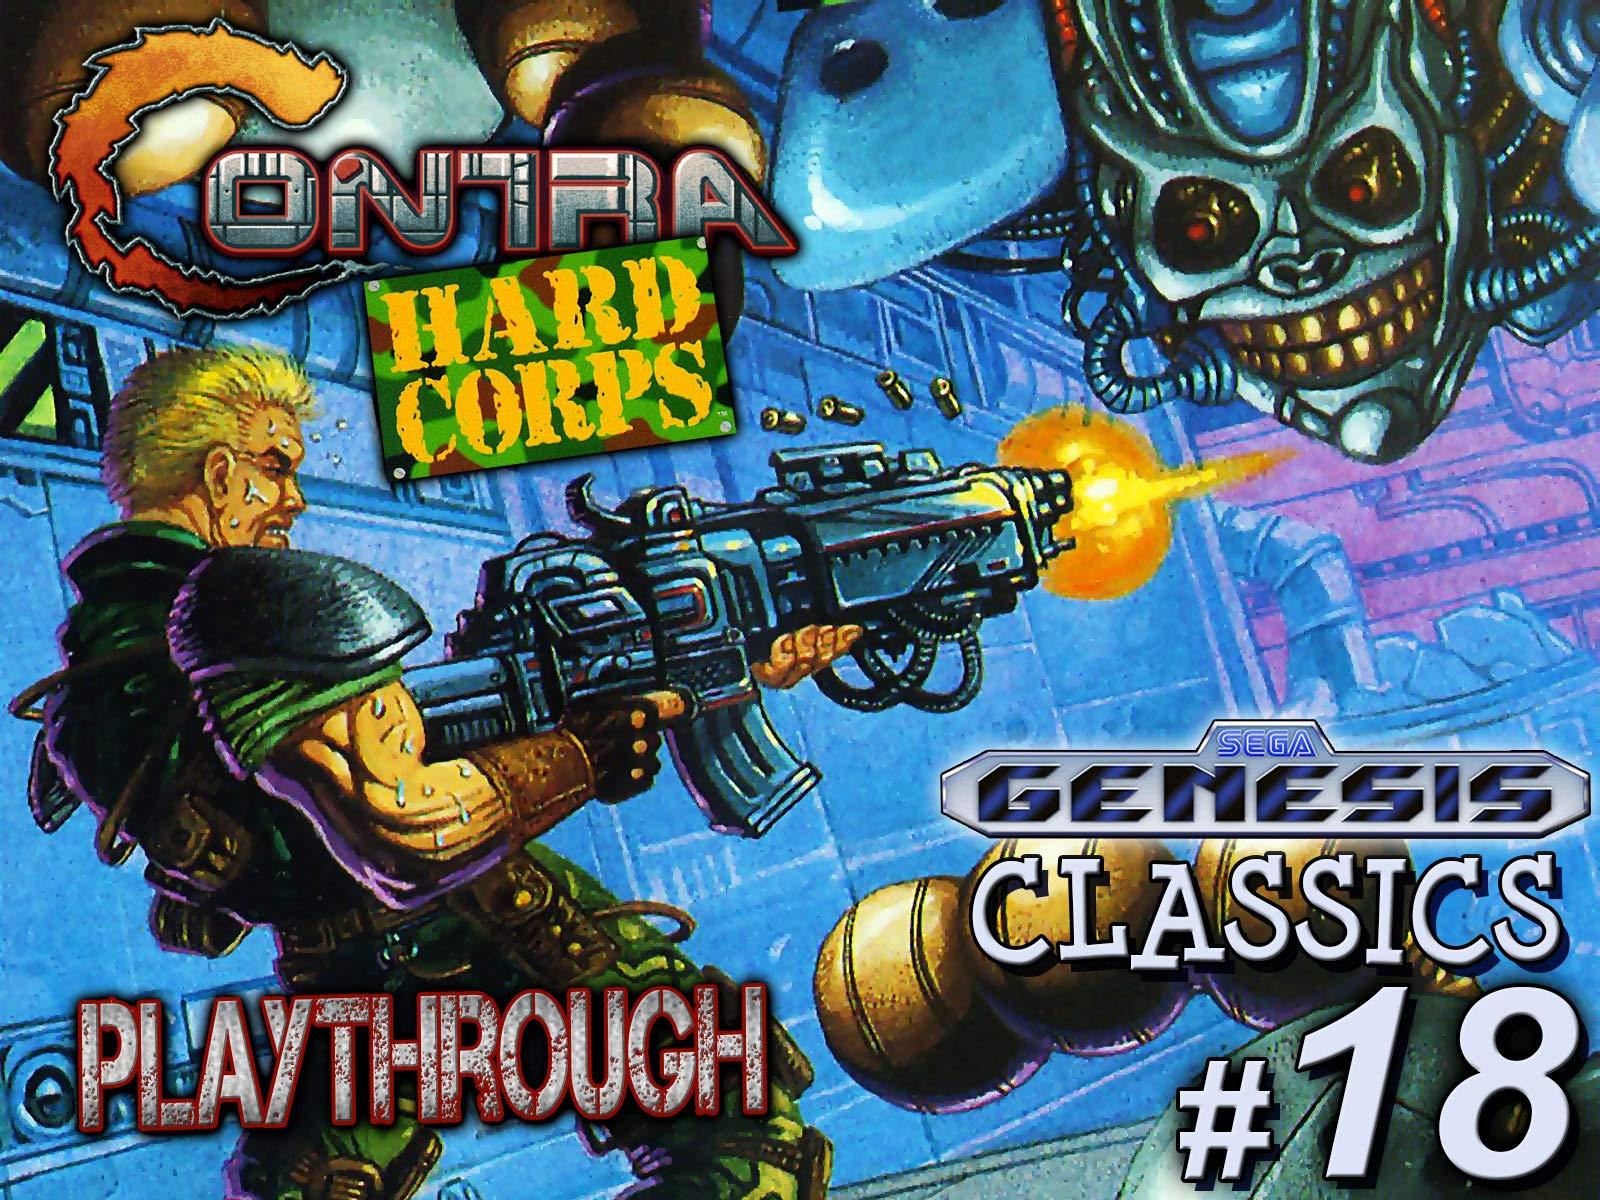 Clip: Contra Hard Corps Playthrough (Genesis Classics 18) - Season 1